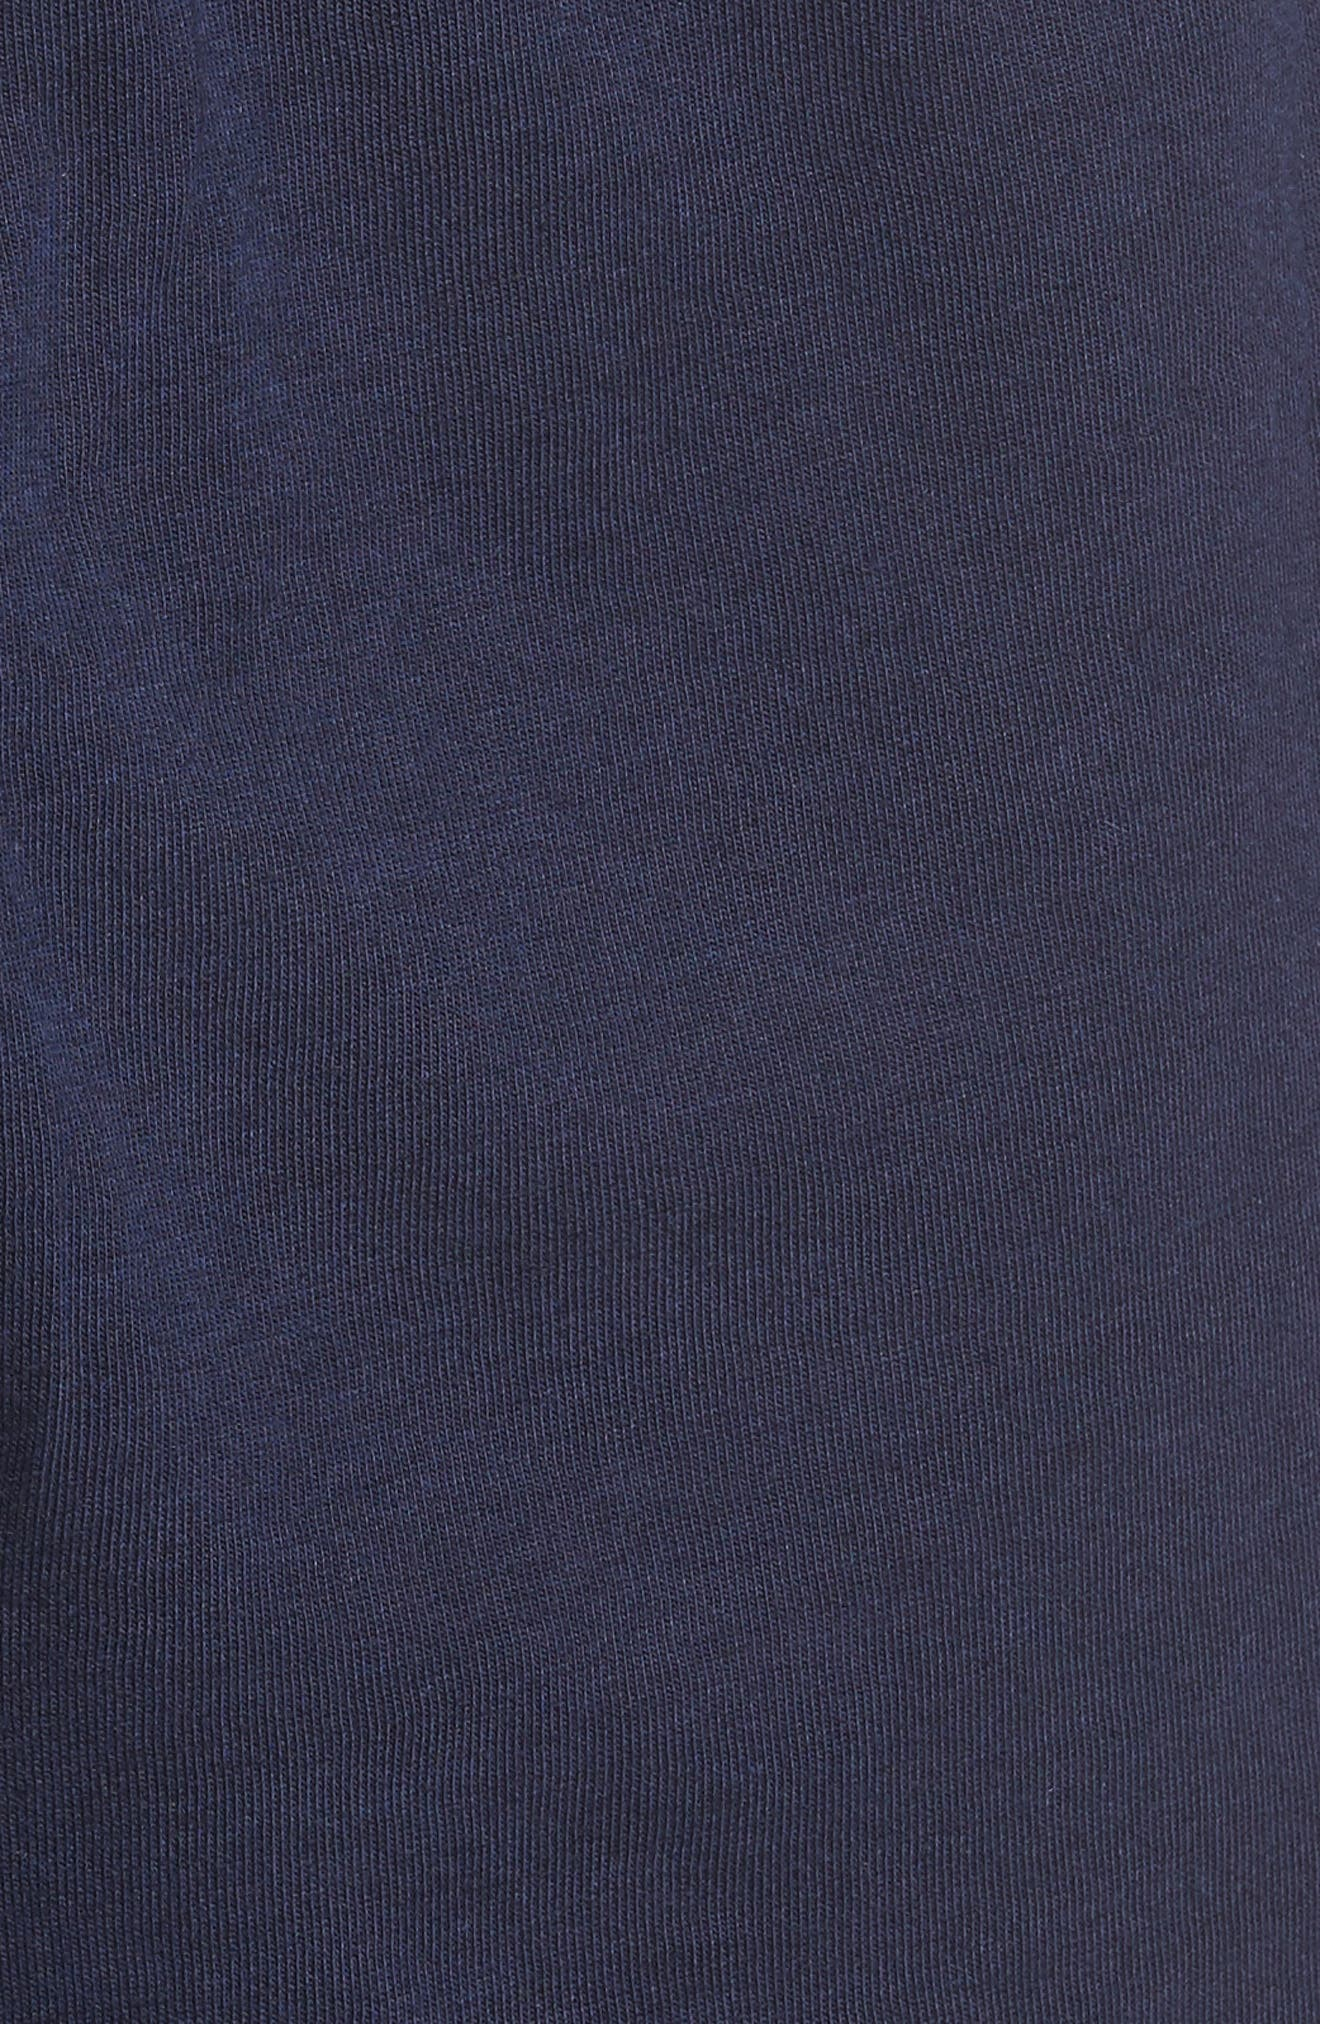 Cotton & Modal Boxers,                             Alternate thumbnail 27, color,